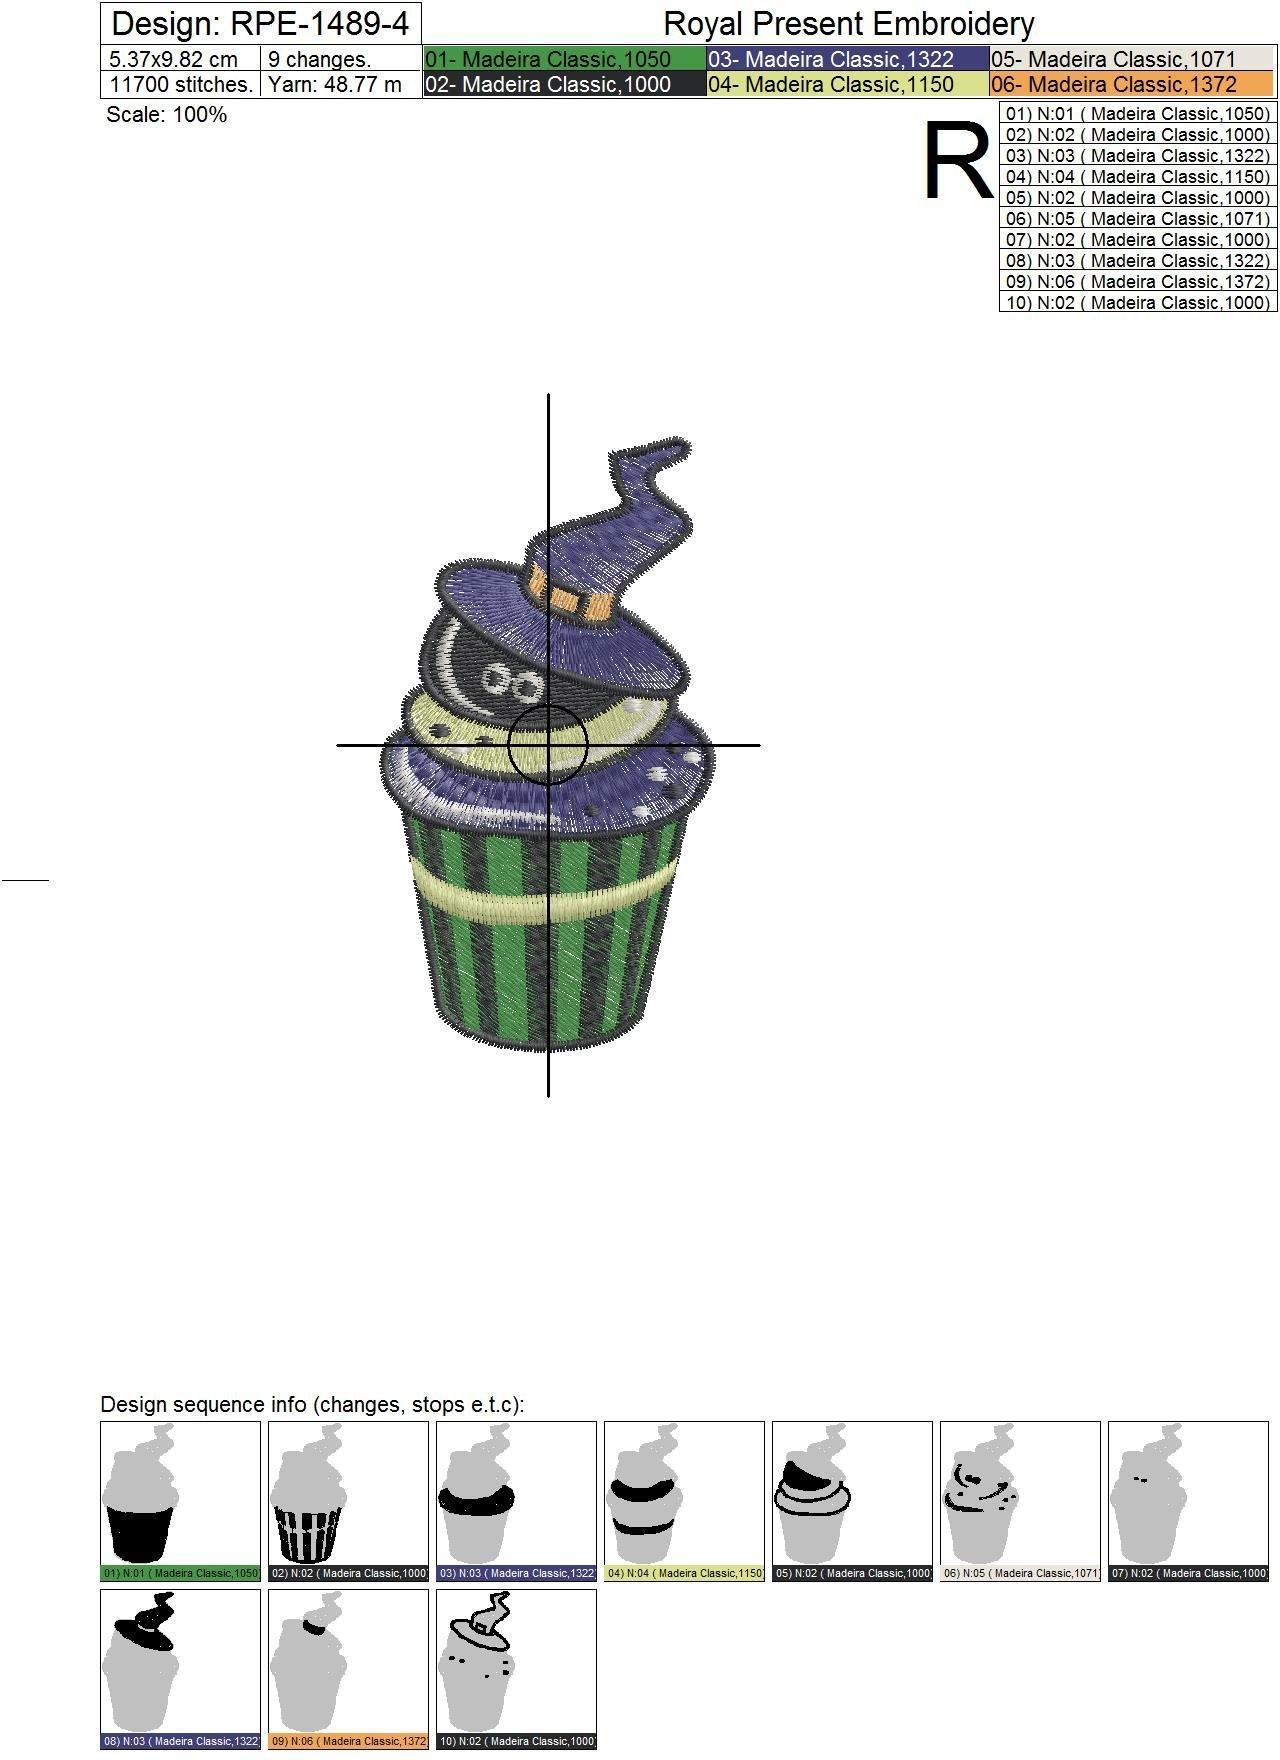 Halloween Cupcake Machine Embroidery Design - 3 sizes